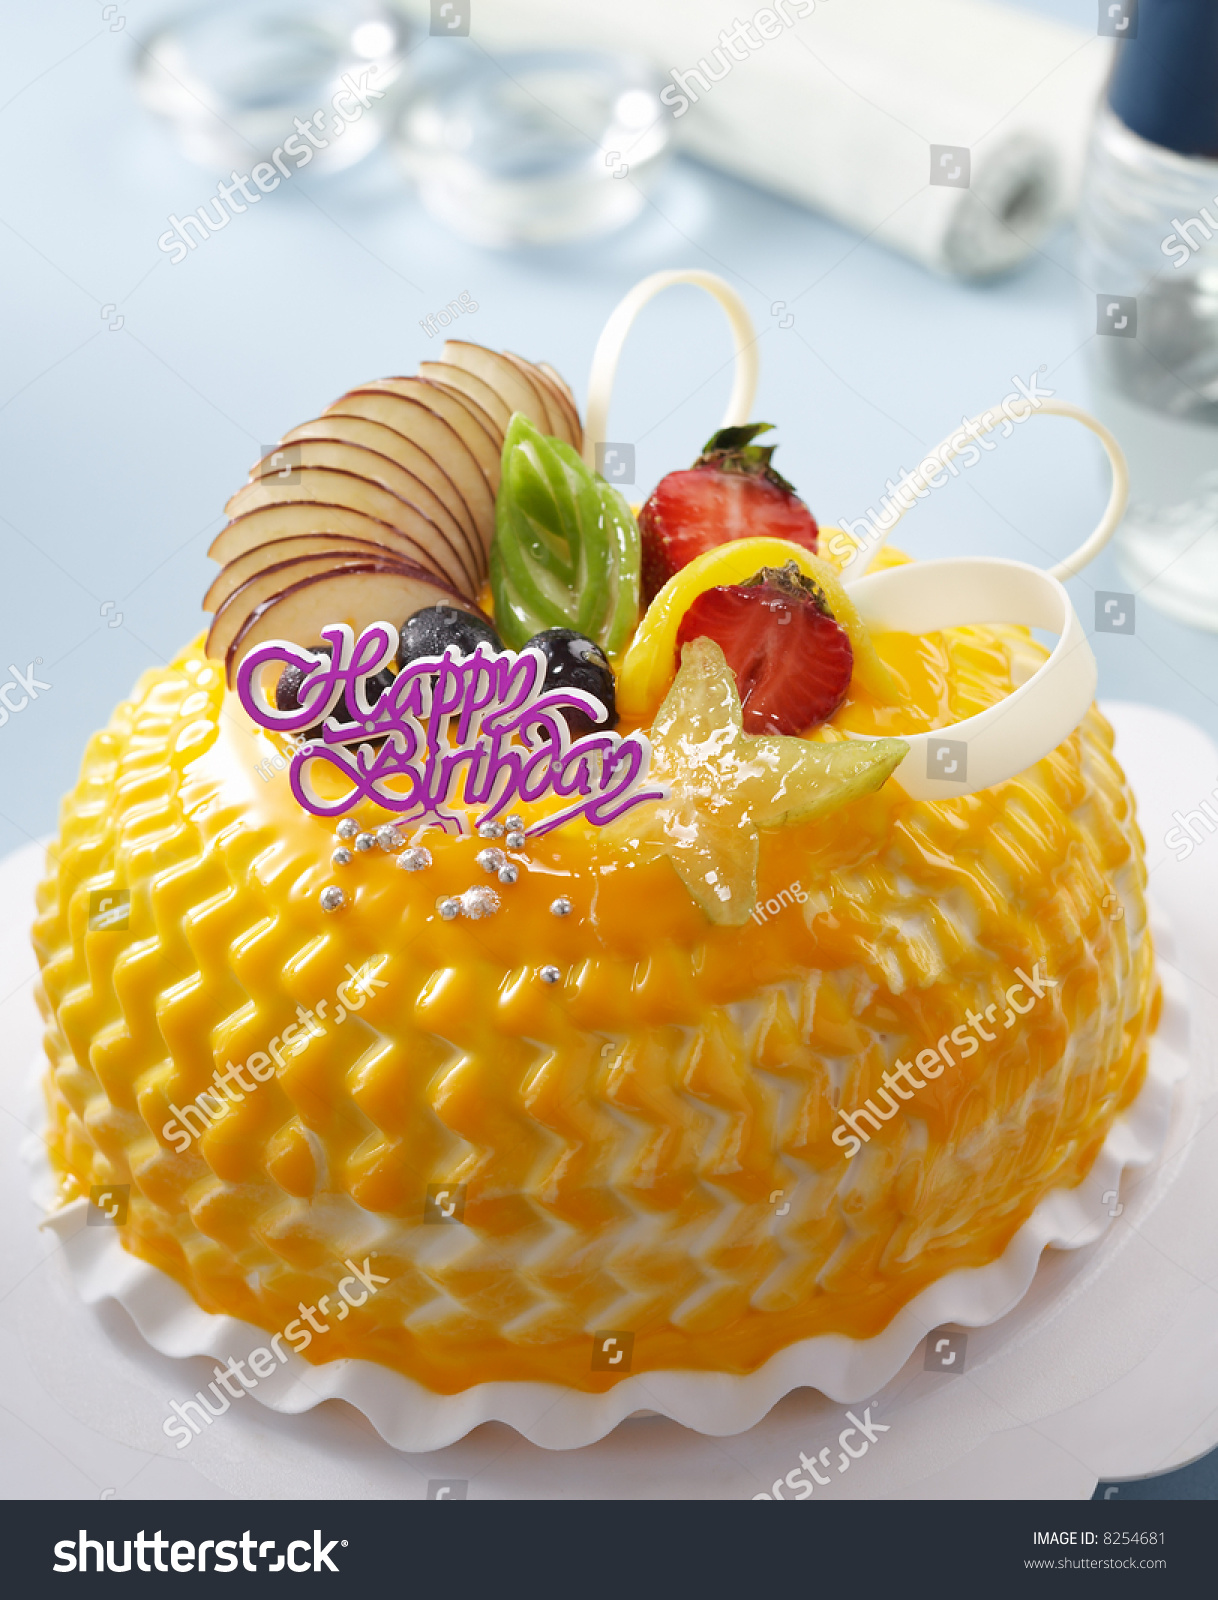 Birthday Cake Fruits Chocolate Decoration Stock Photo Royalty Free